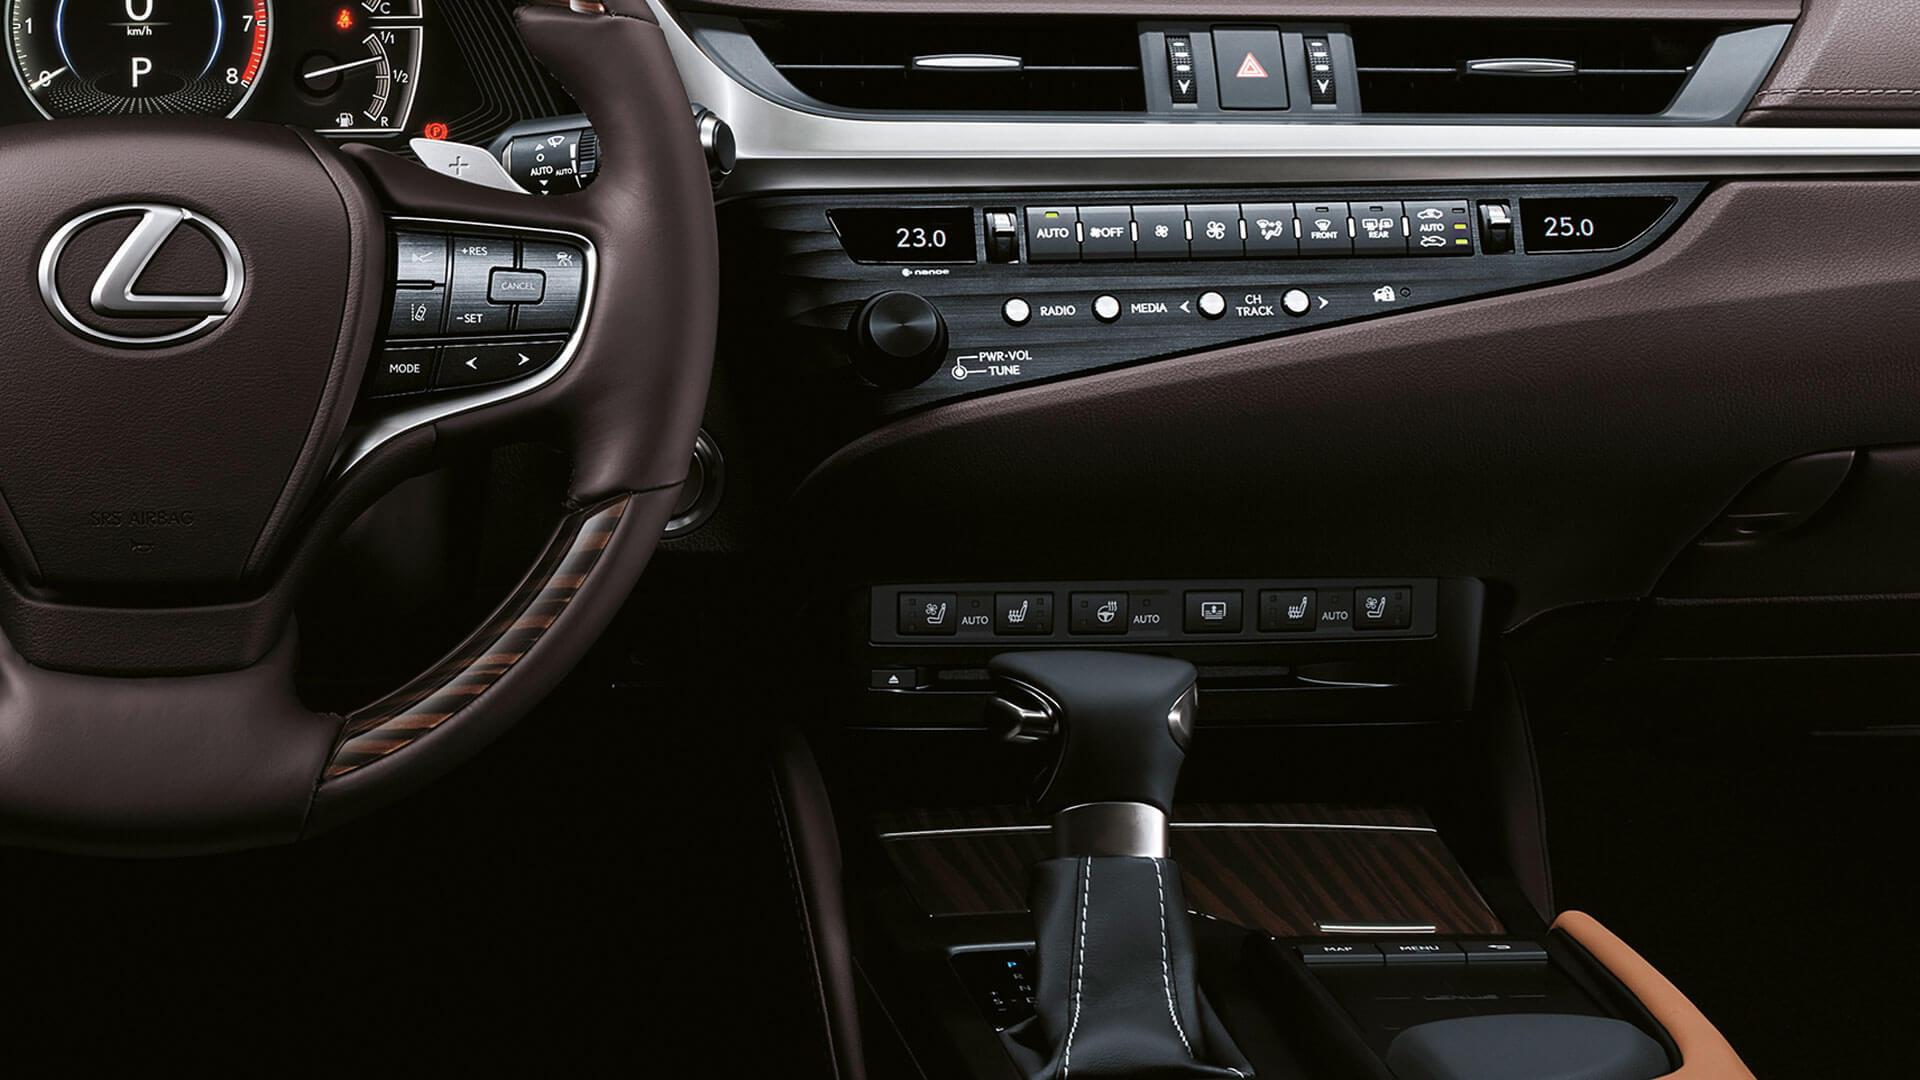 2018 lexus es experience front seats heating ventilation